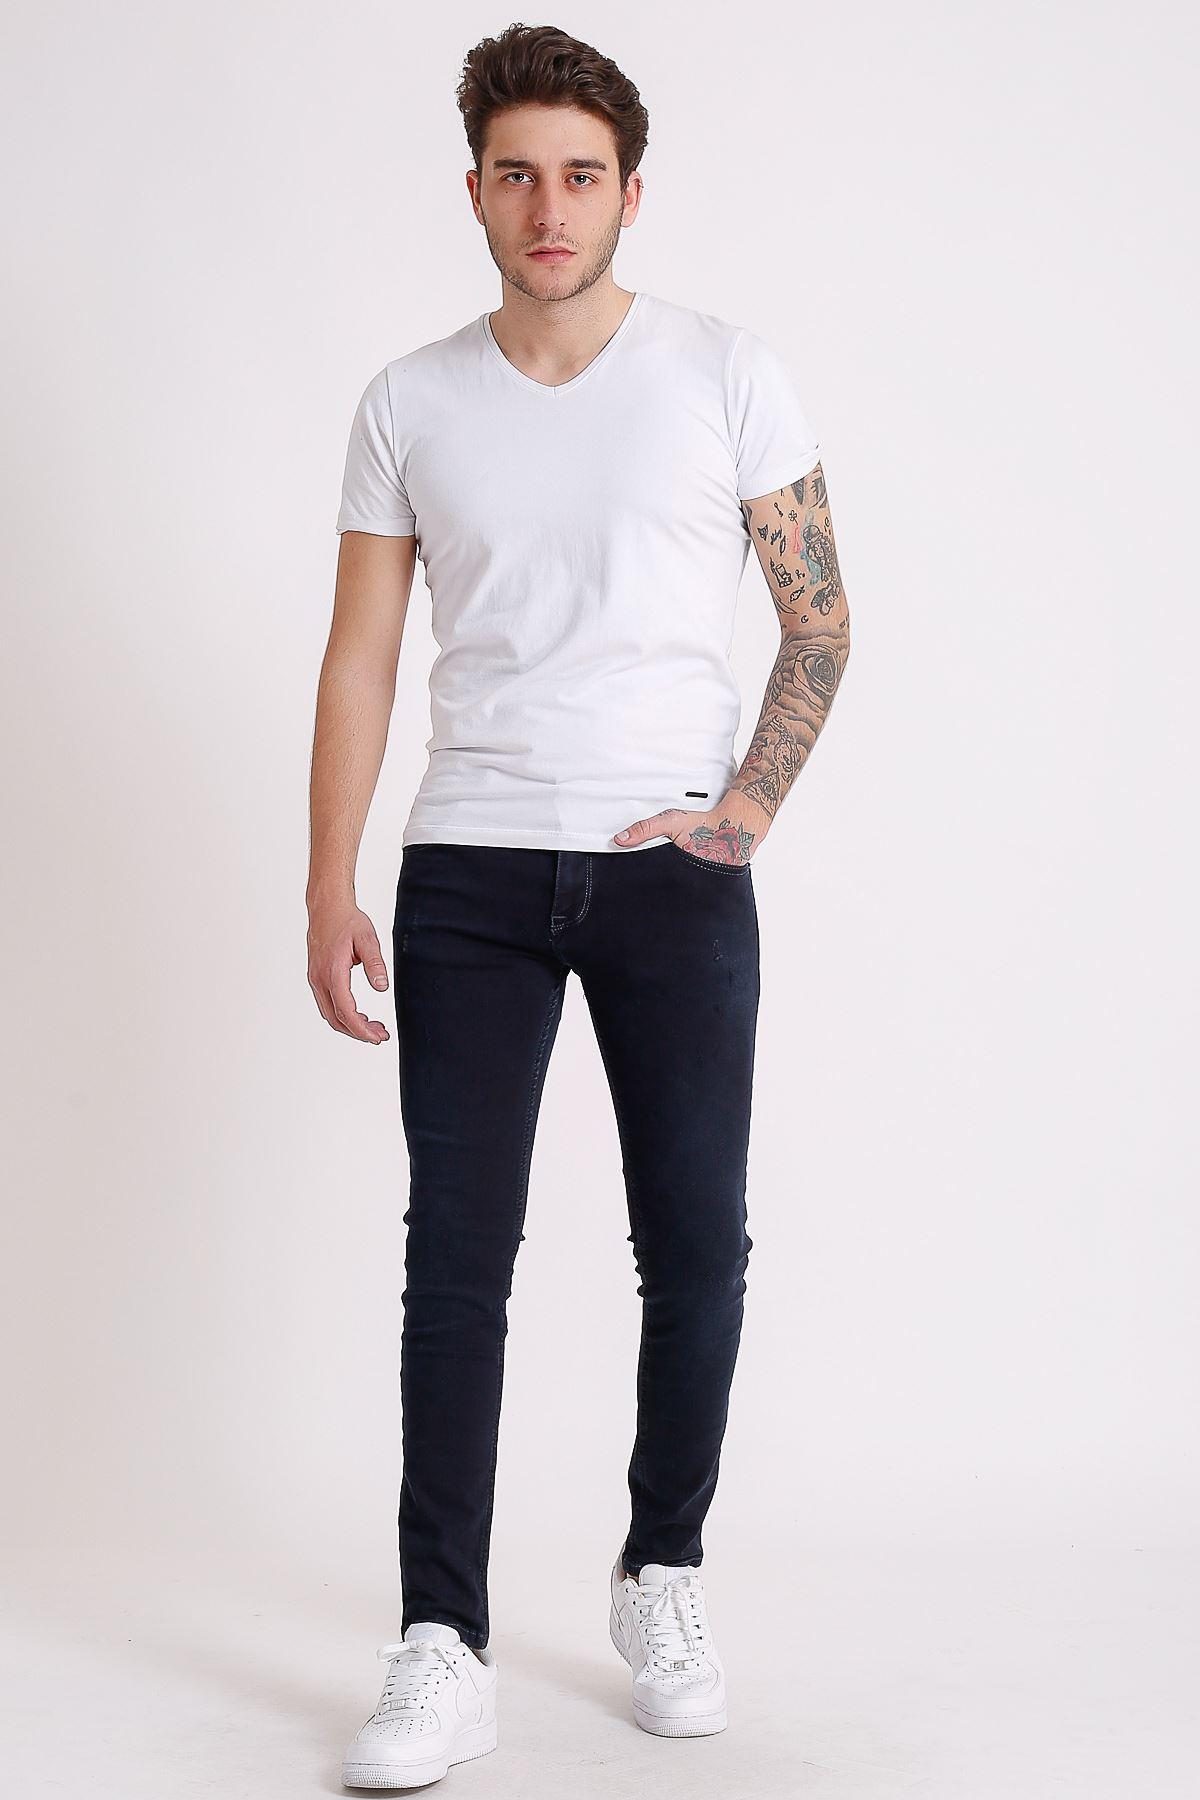 Lacivert Süperslim/sknny Fit Fermuarlı Erkek Jeans Pantolon